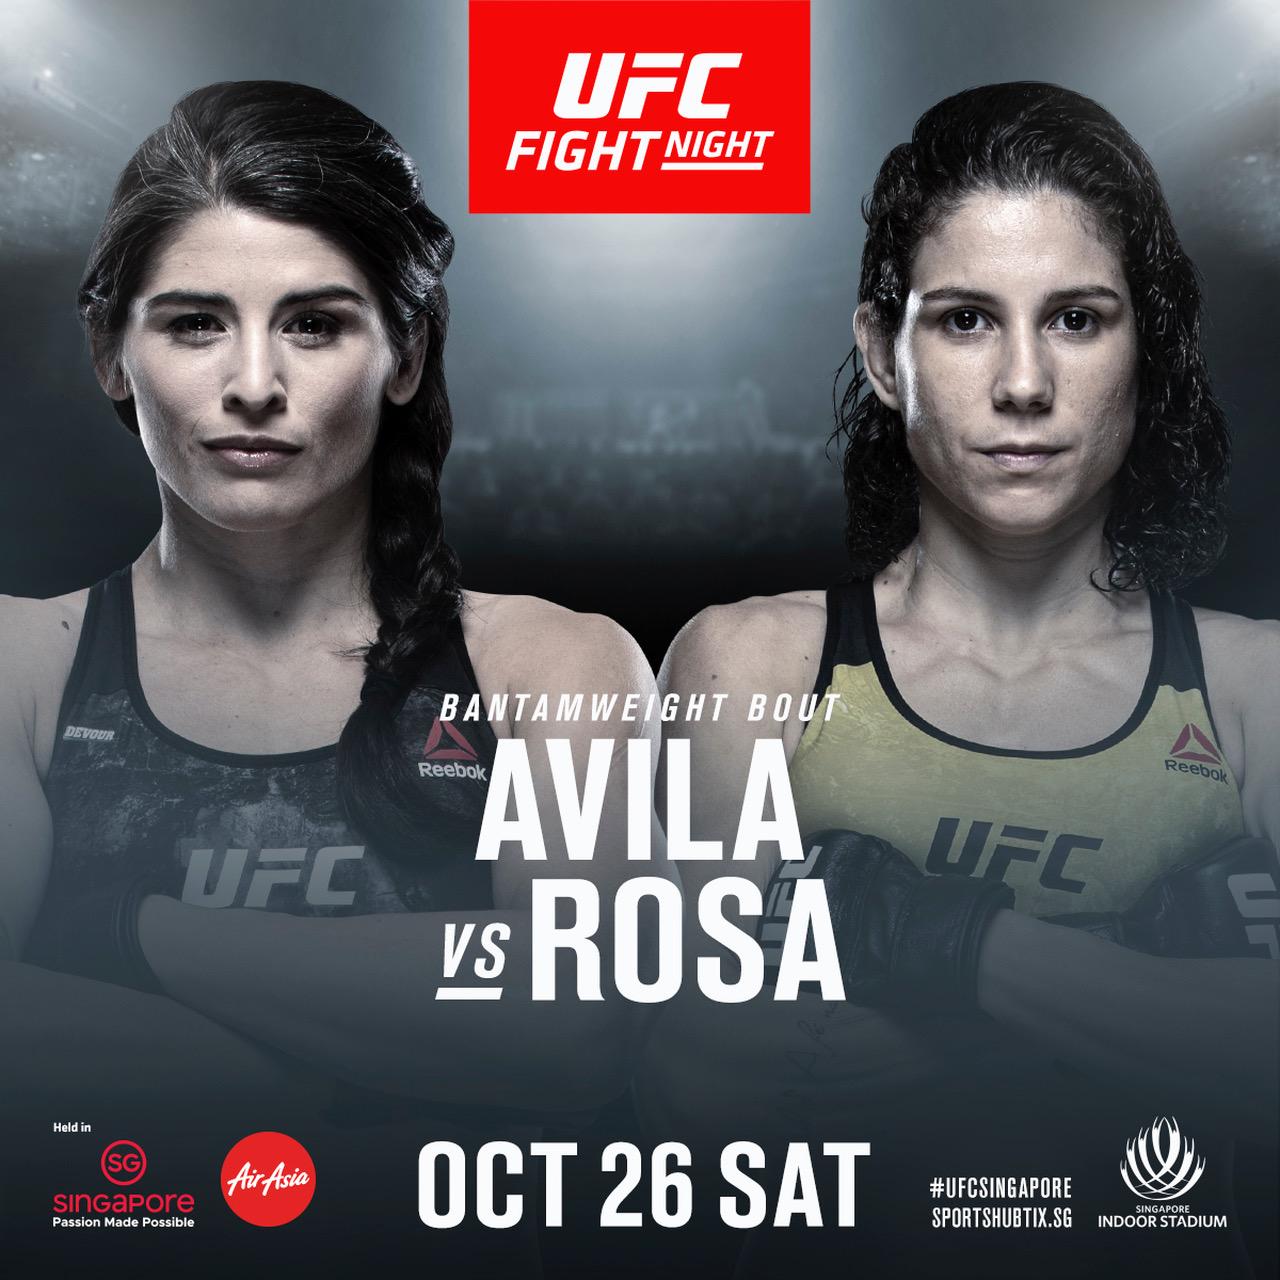 UFC Singapore update: Five more bouts official, including Salikhov vs Staropoli, Barzola vs Evloev - UFC Singapore